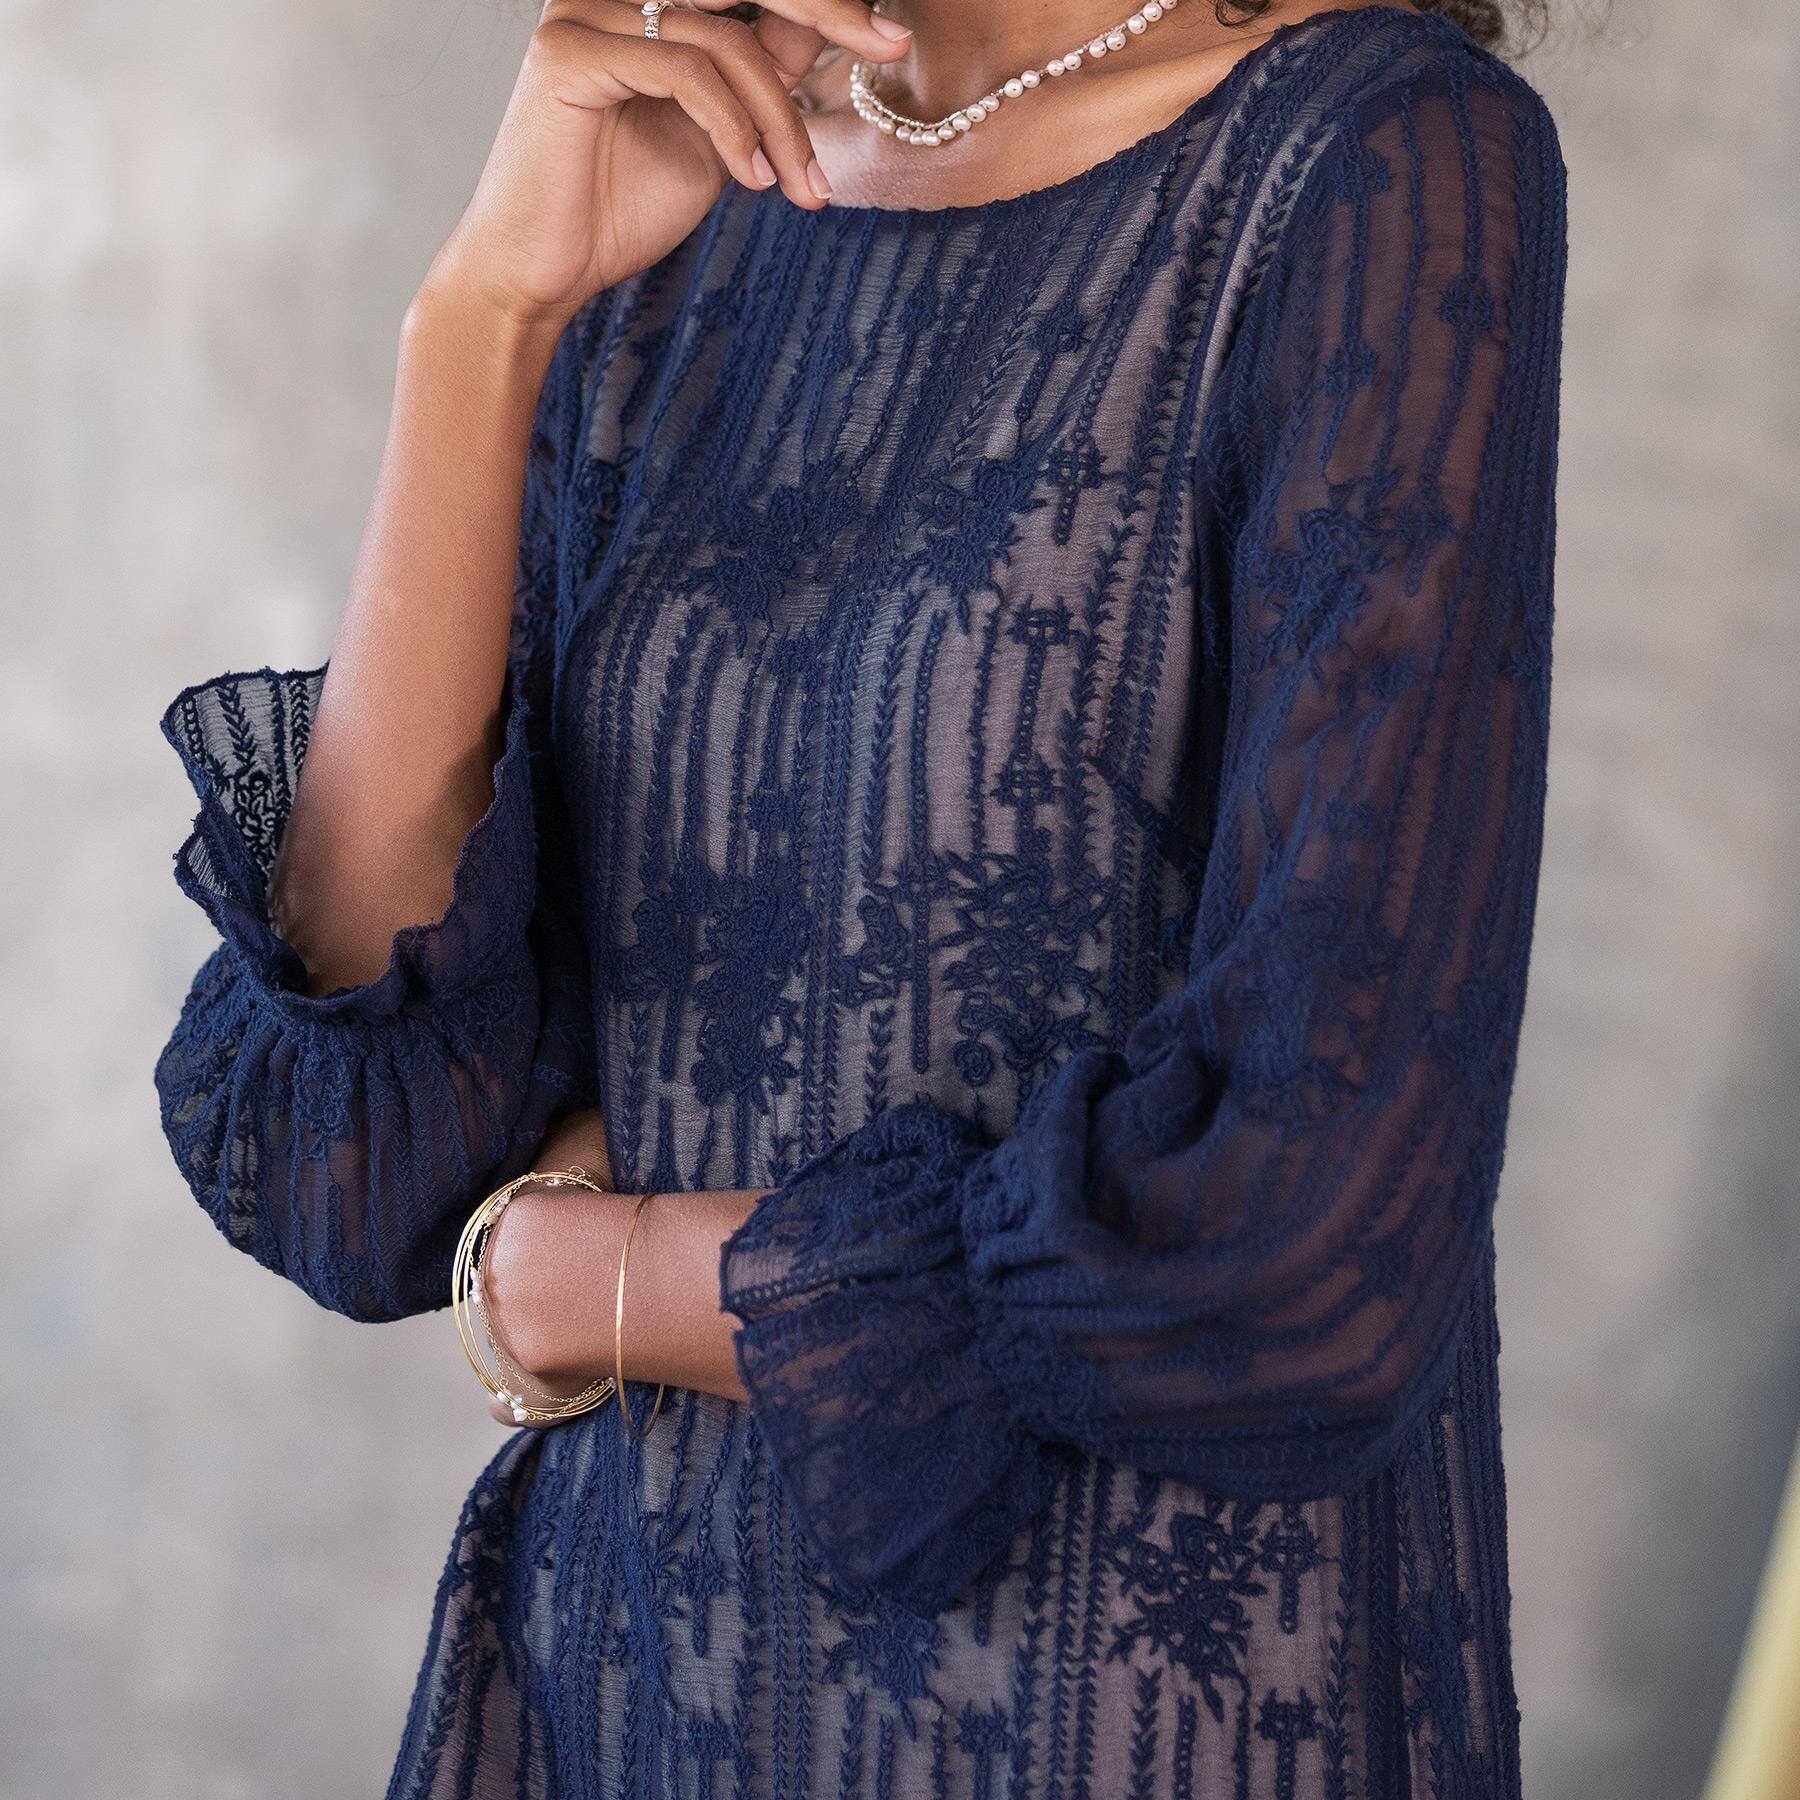 EMMA GRACEFUL SHEATH DRESS - PETITES: View 3